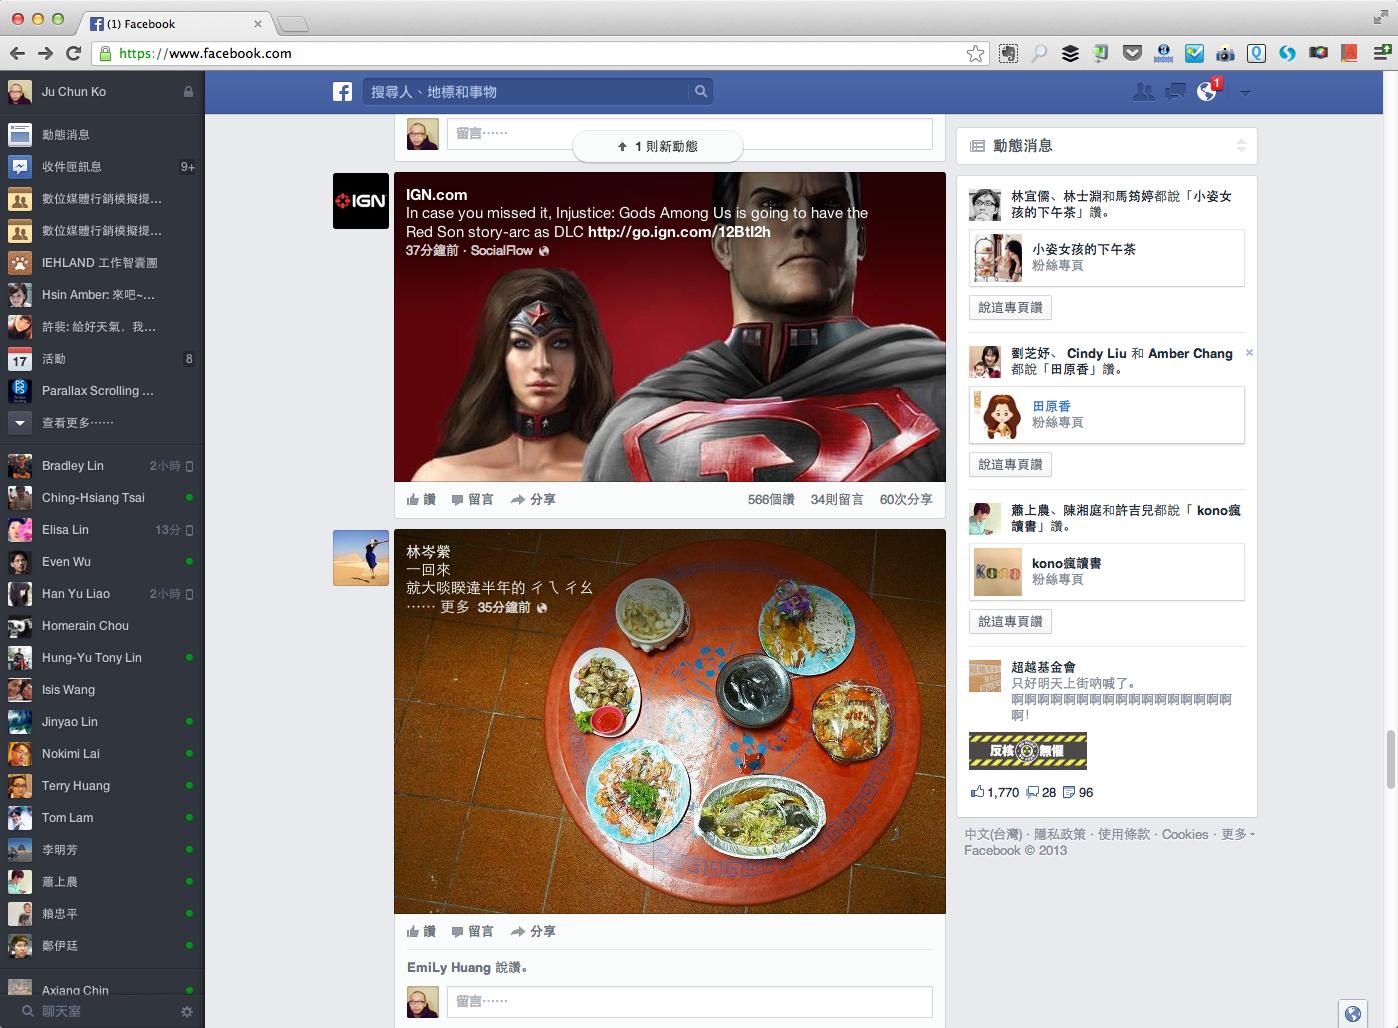 (1) Facebook-9